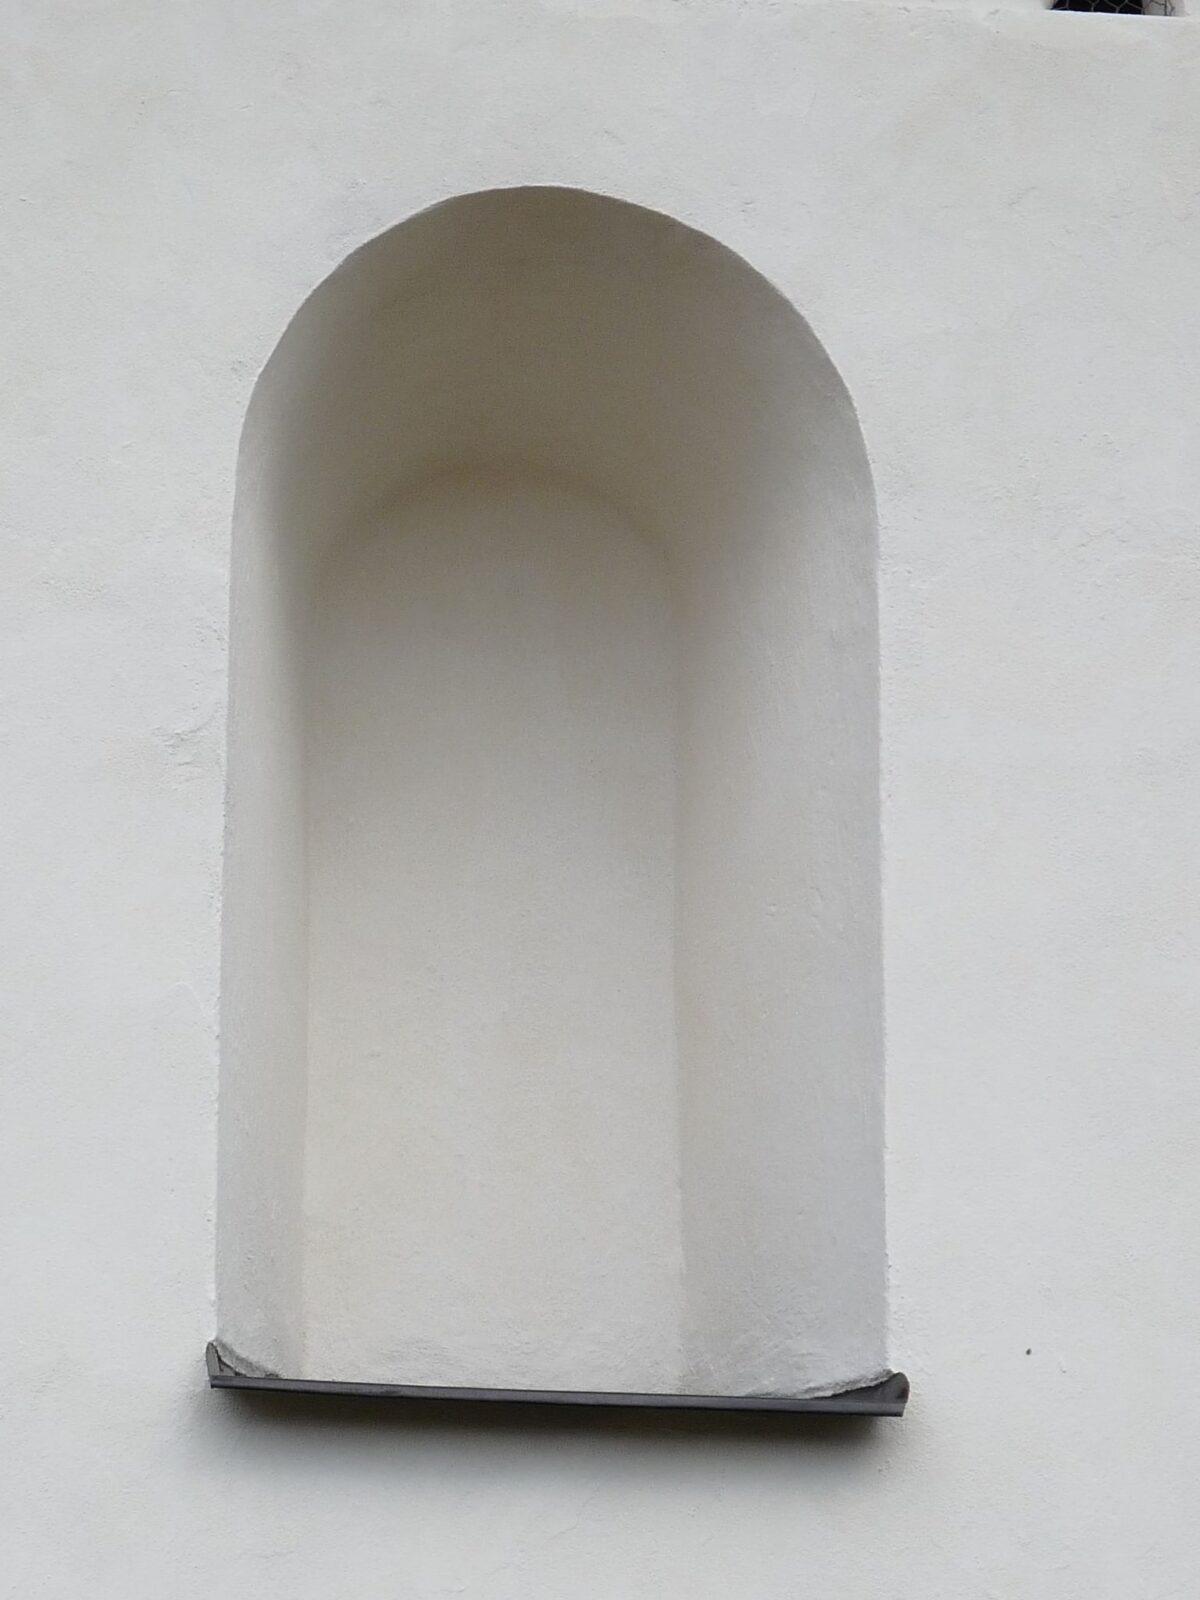 Askeby kyrka-P1030266-e1352223174228